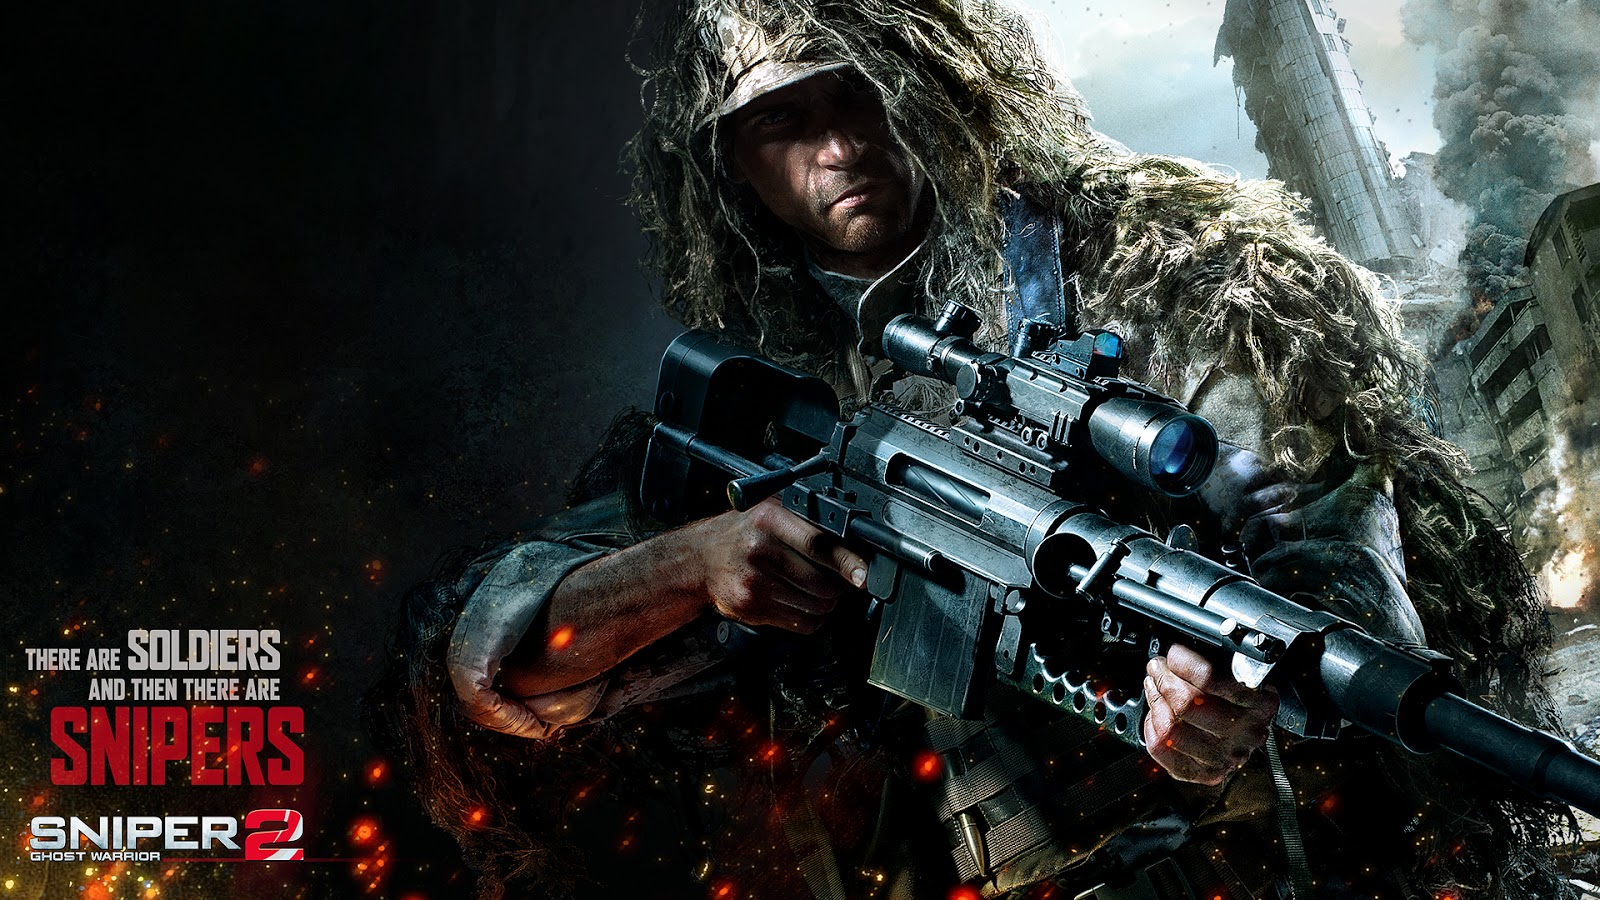 Awesome: Sniper Ghost Warrior 2 Download Links, Crack